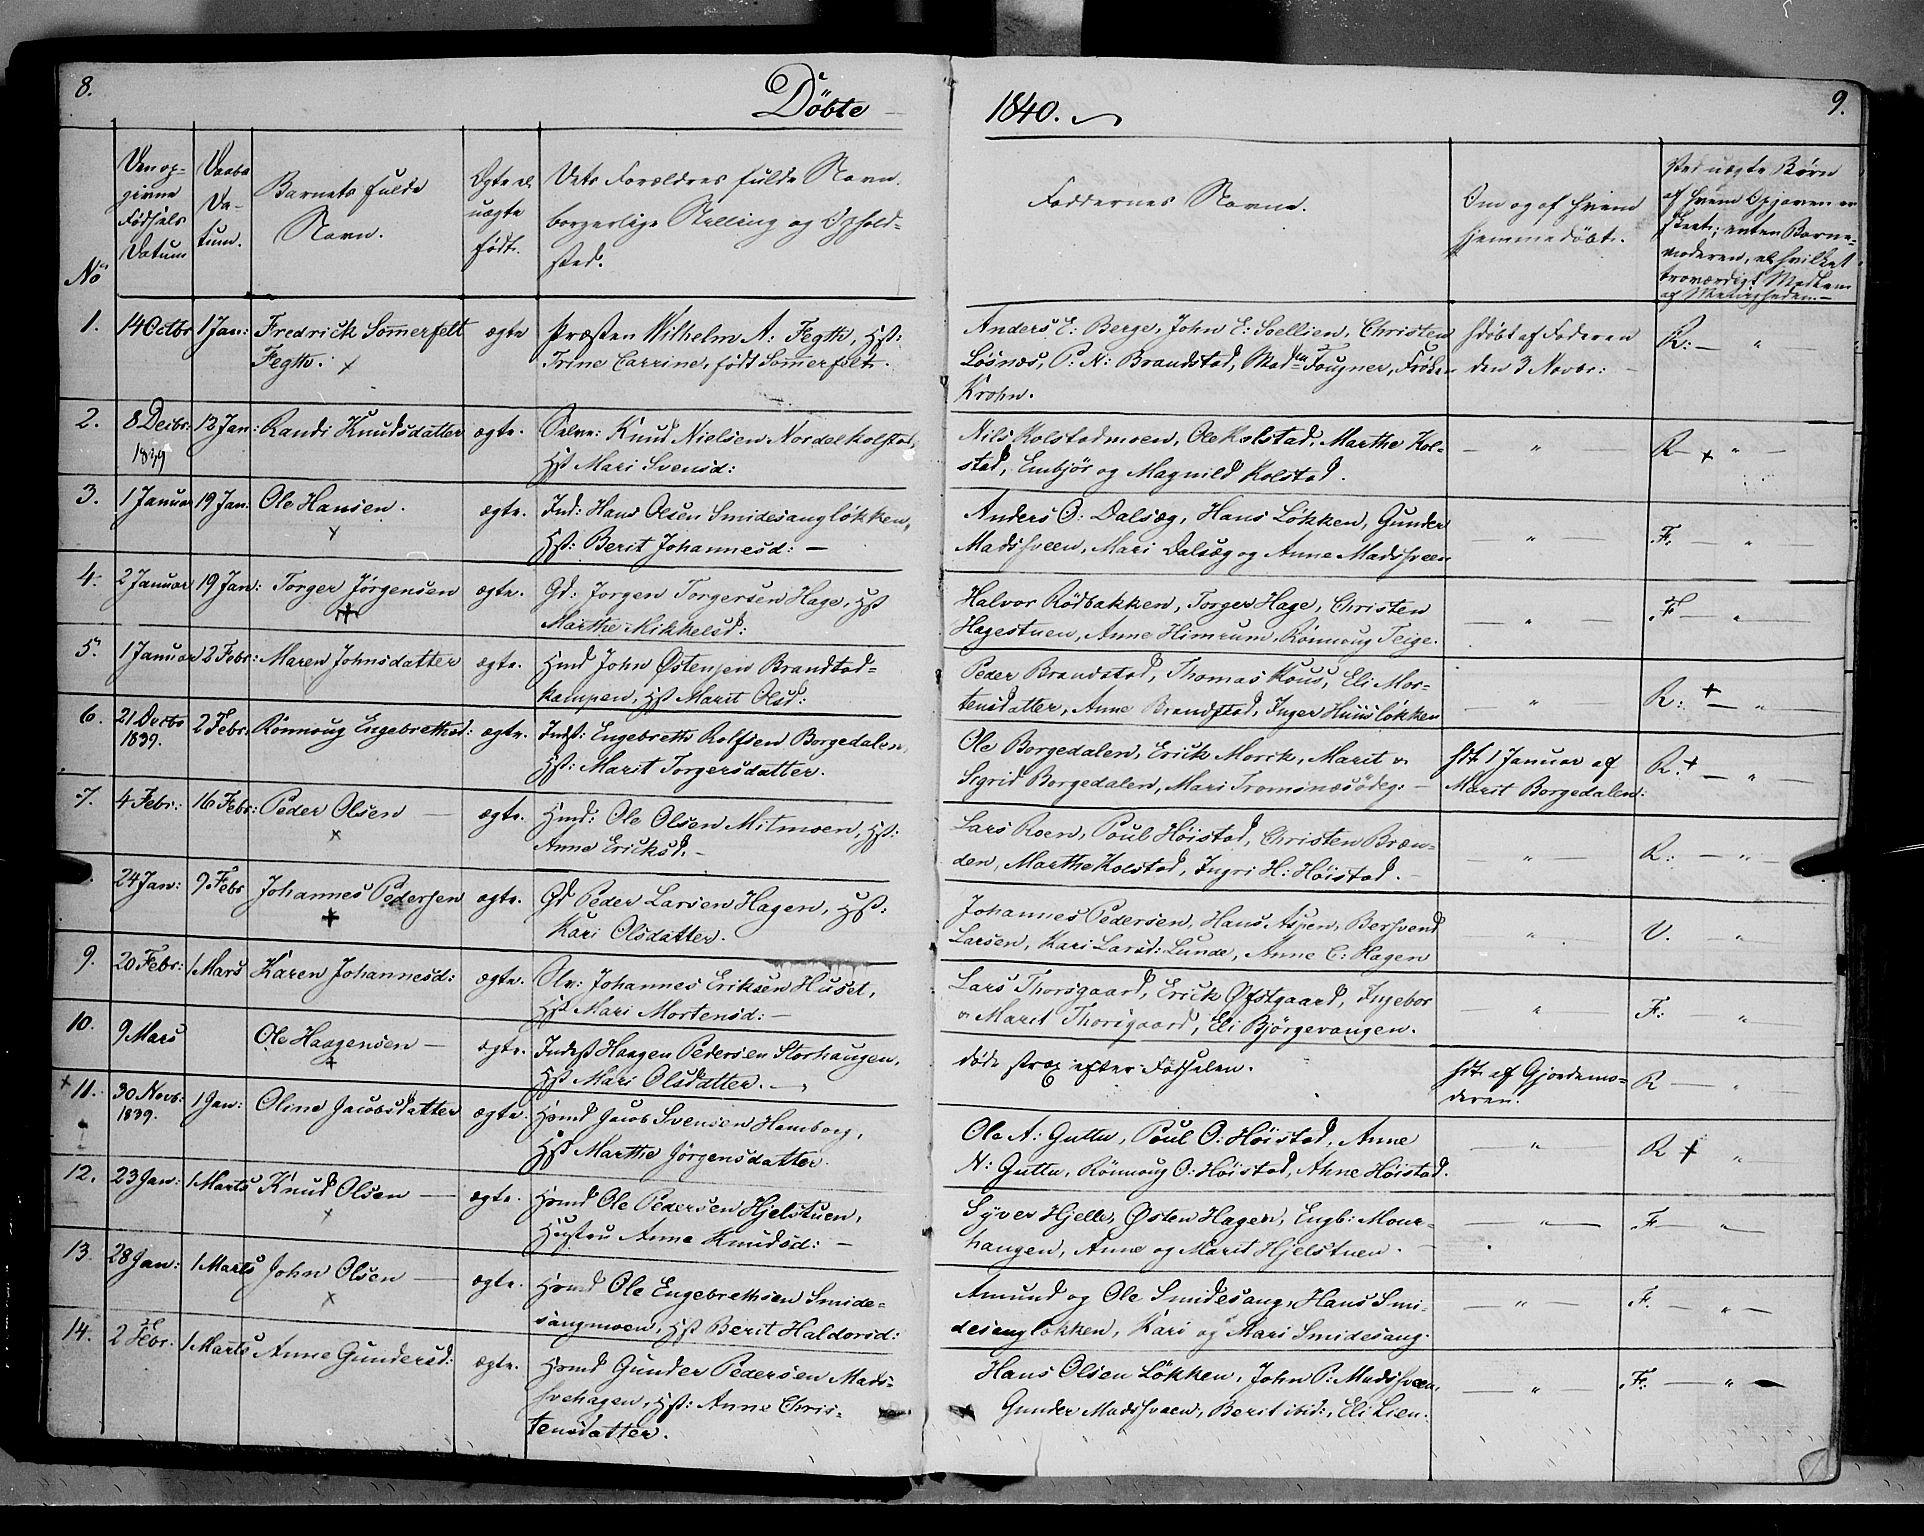 SAH, Ringebu prestekontor, Ministerialbok nr. 5, 1839-1848, s. 8-9